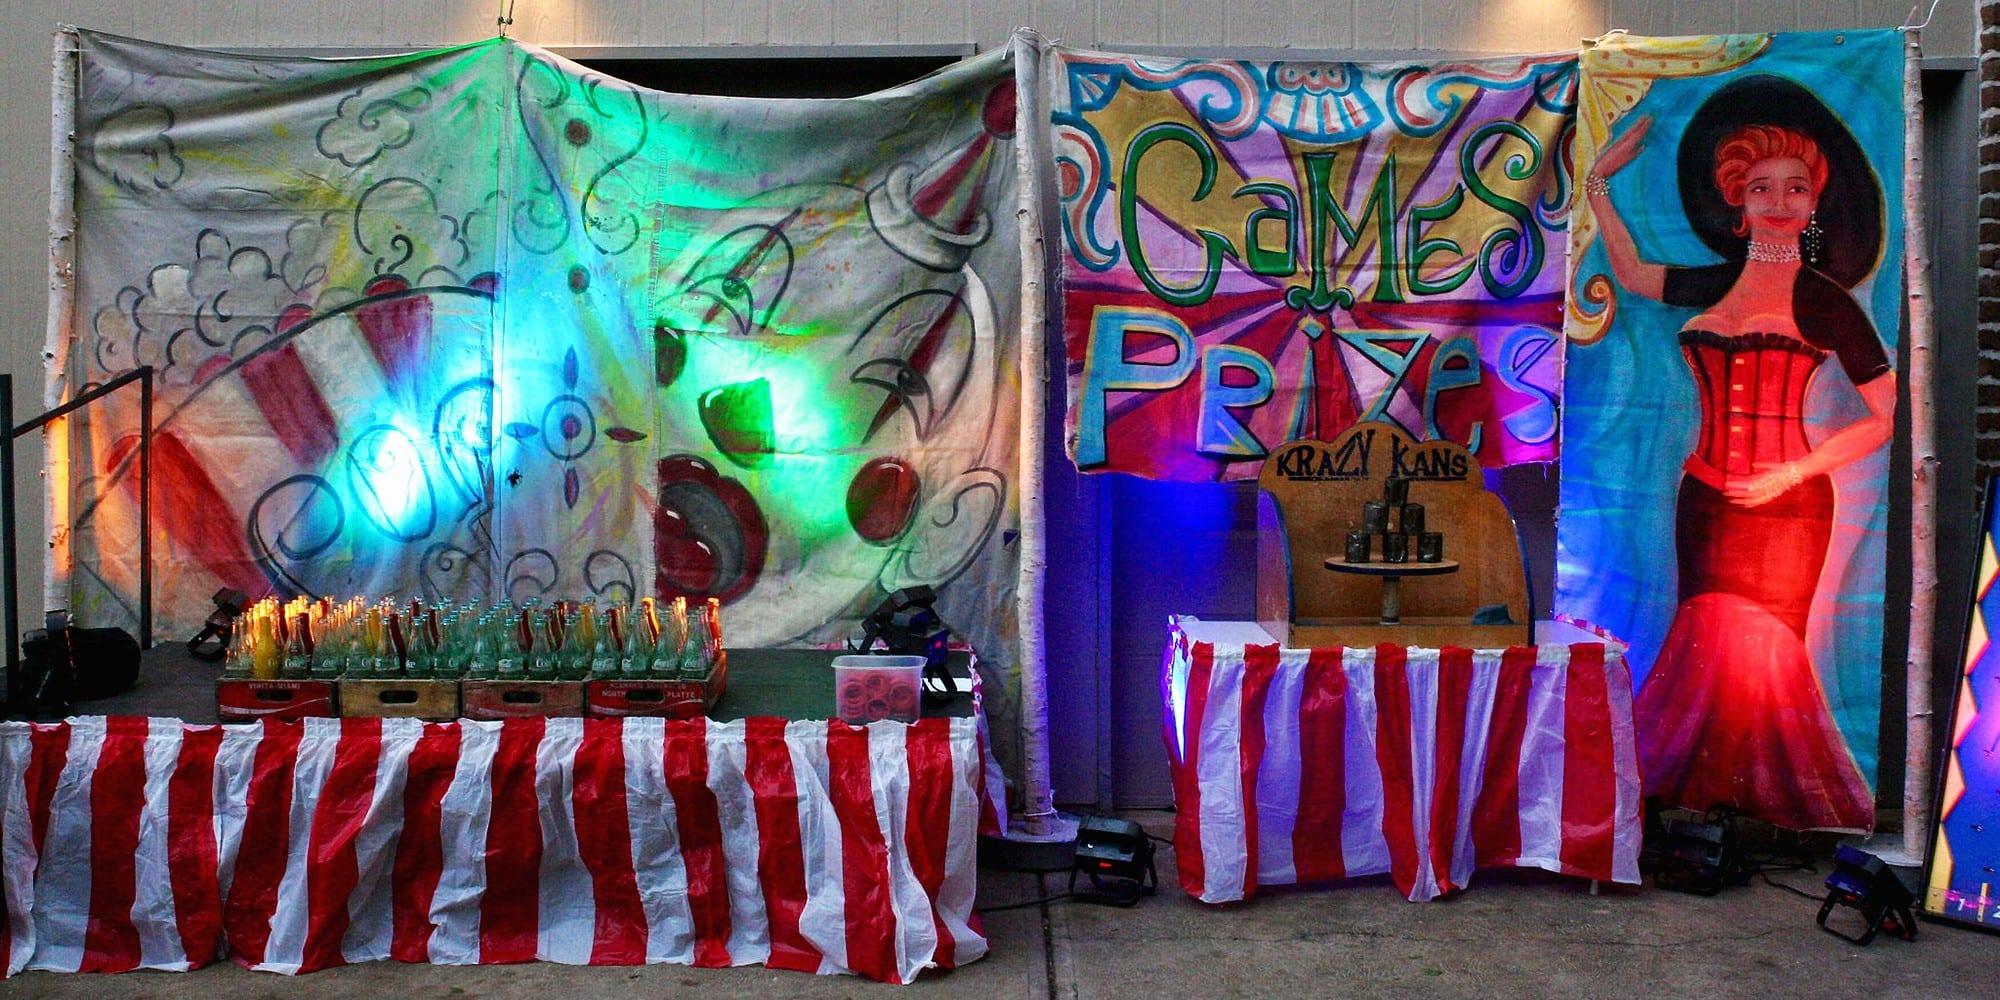 Art by Paul Webb at the Dutchtown Karneval.